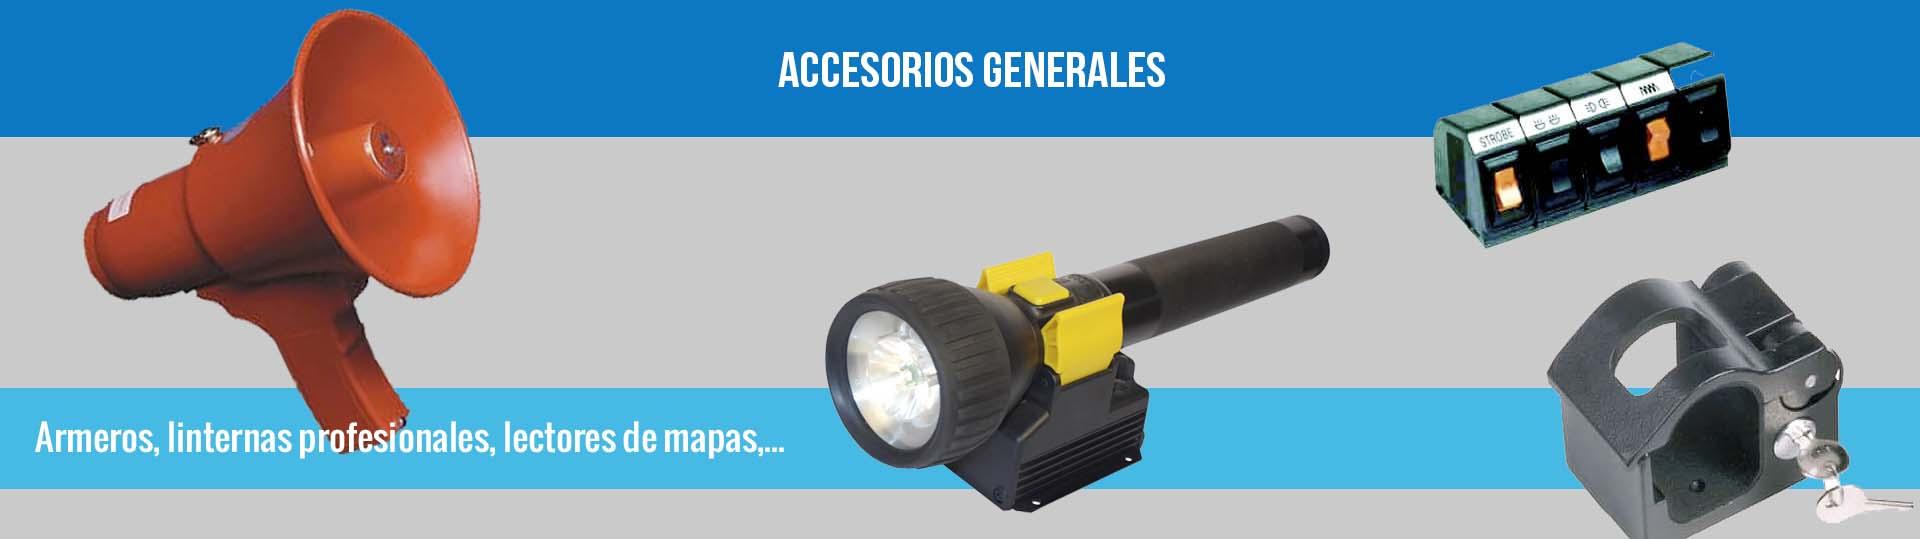 slider-accesorios-generales